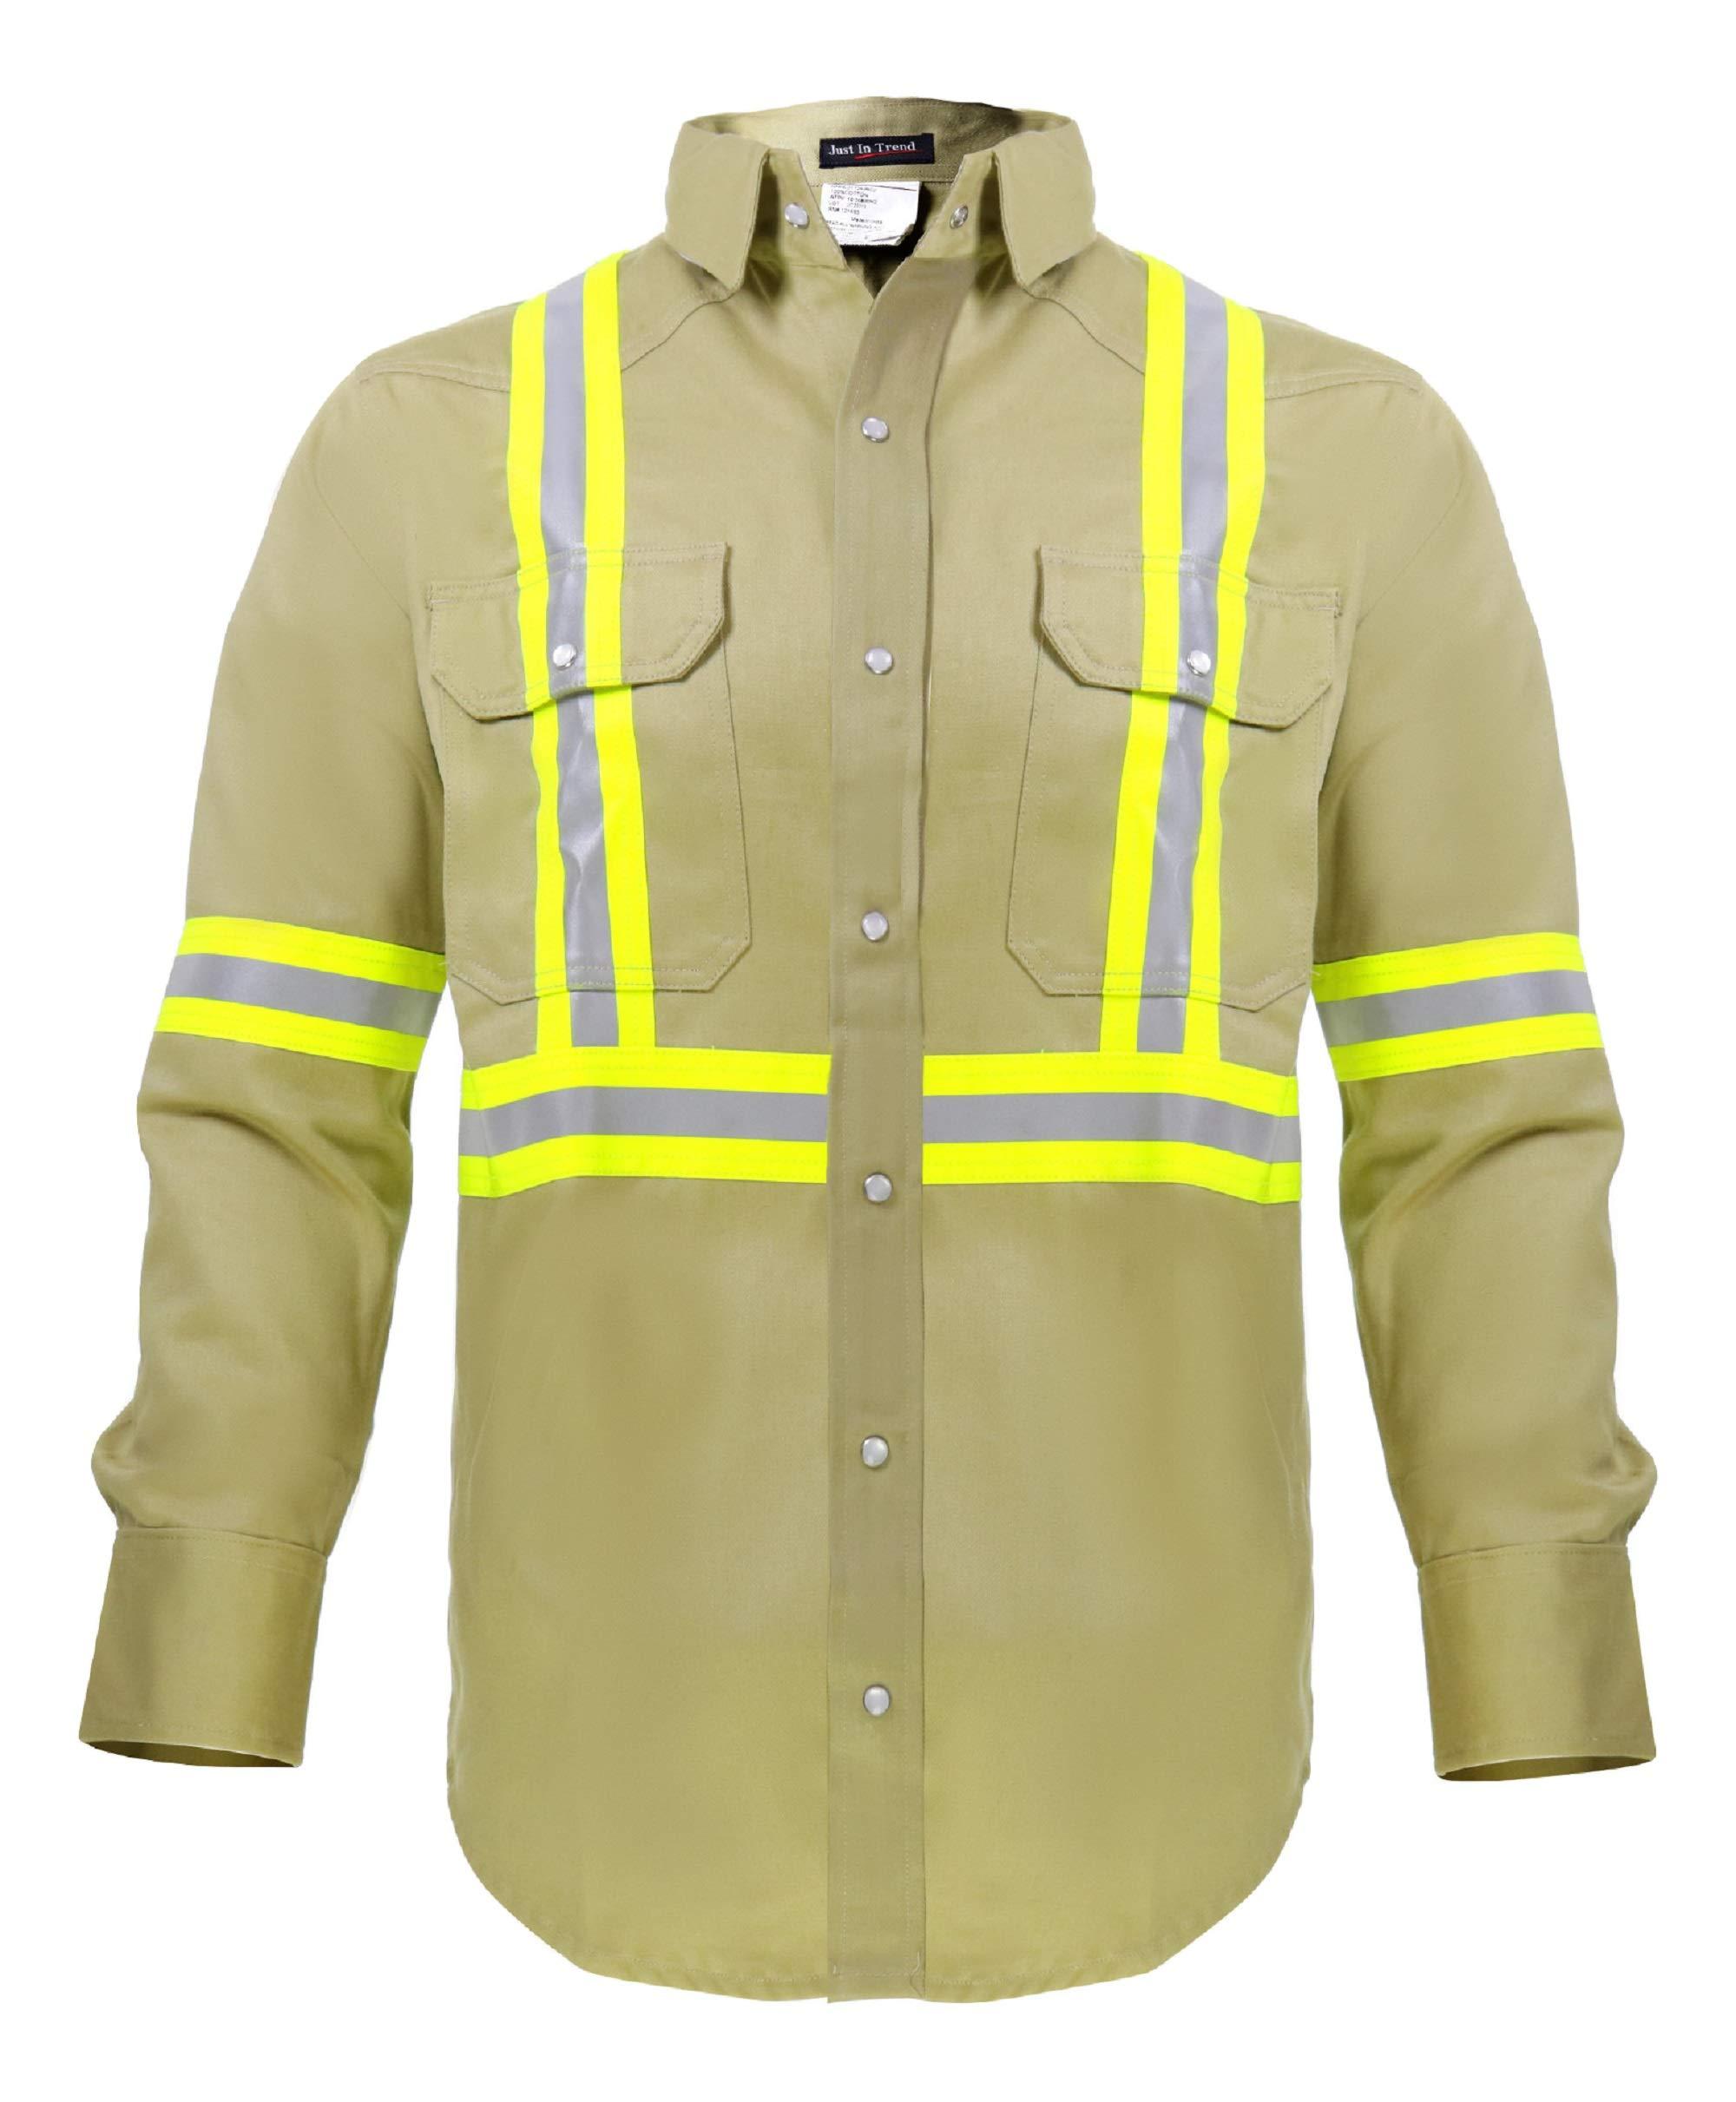 Flame Resistant High Visibility Hi Vis Shirt - 100% C - 7 oz (Large, Khaki)